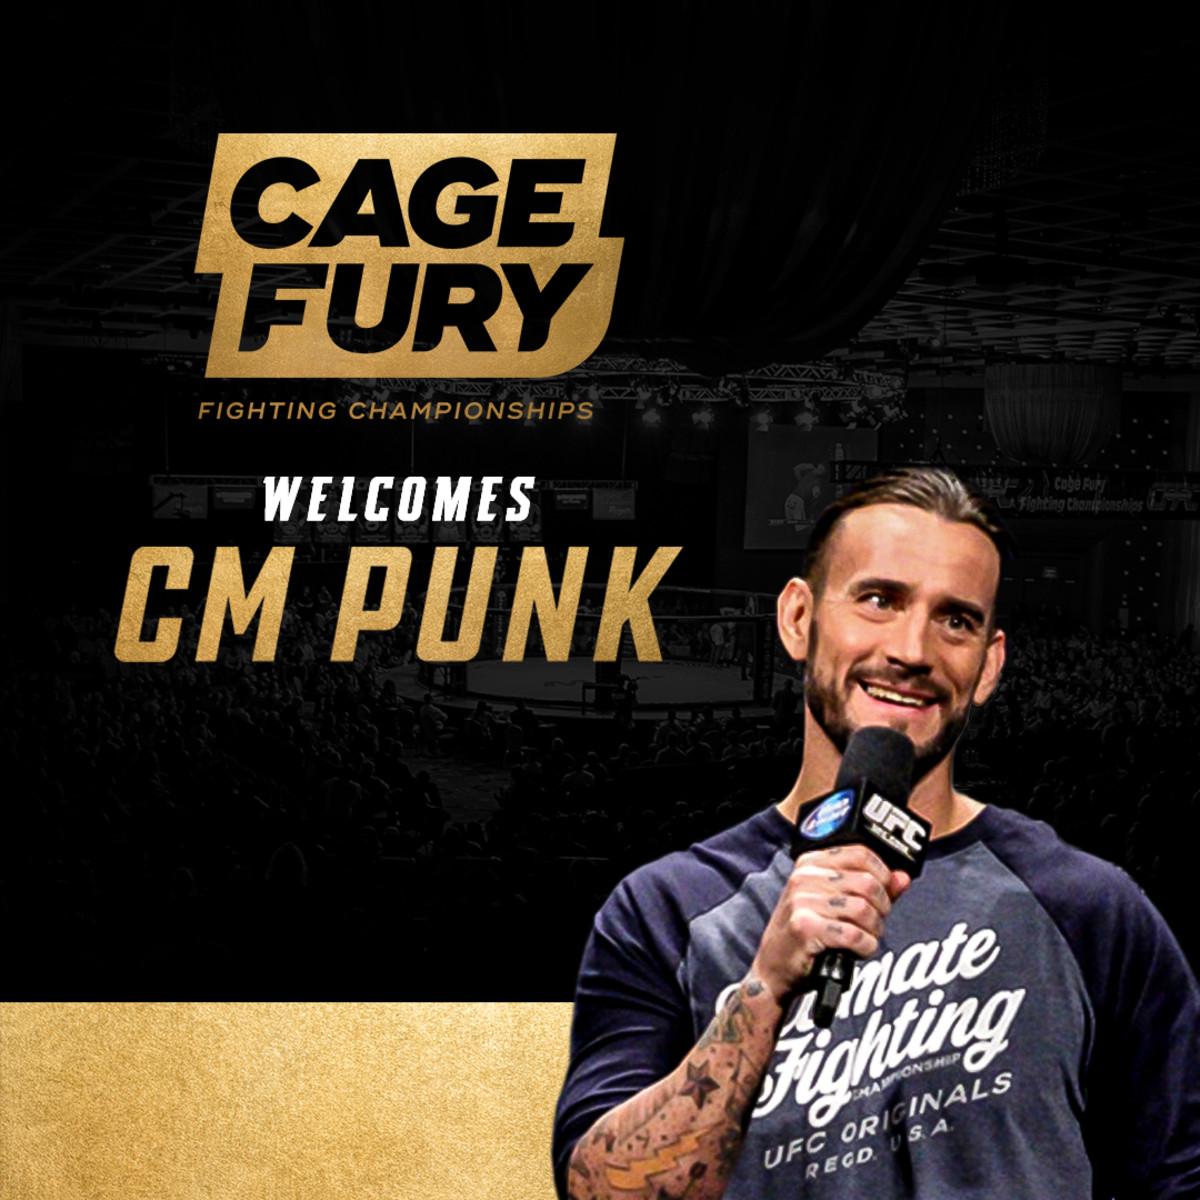 CM Punk / Cage Fury